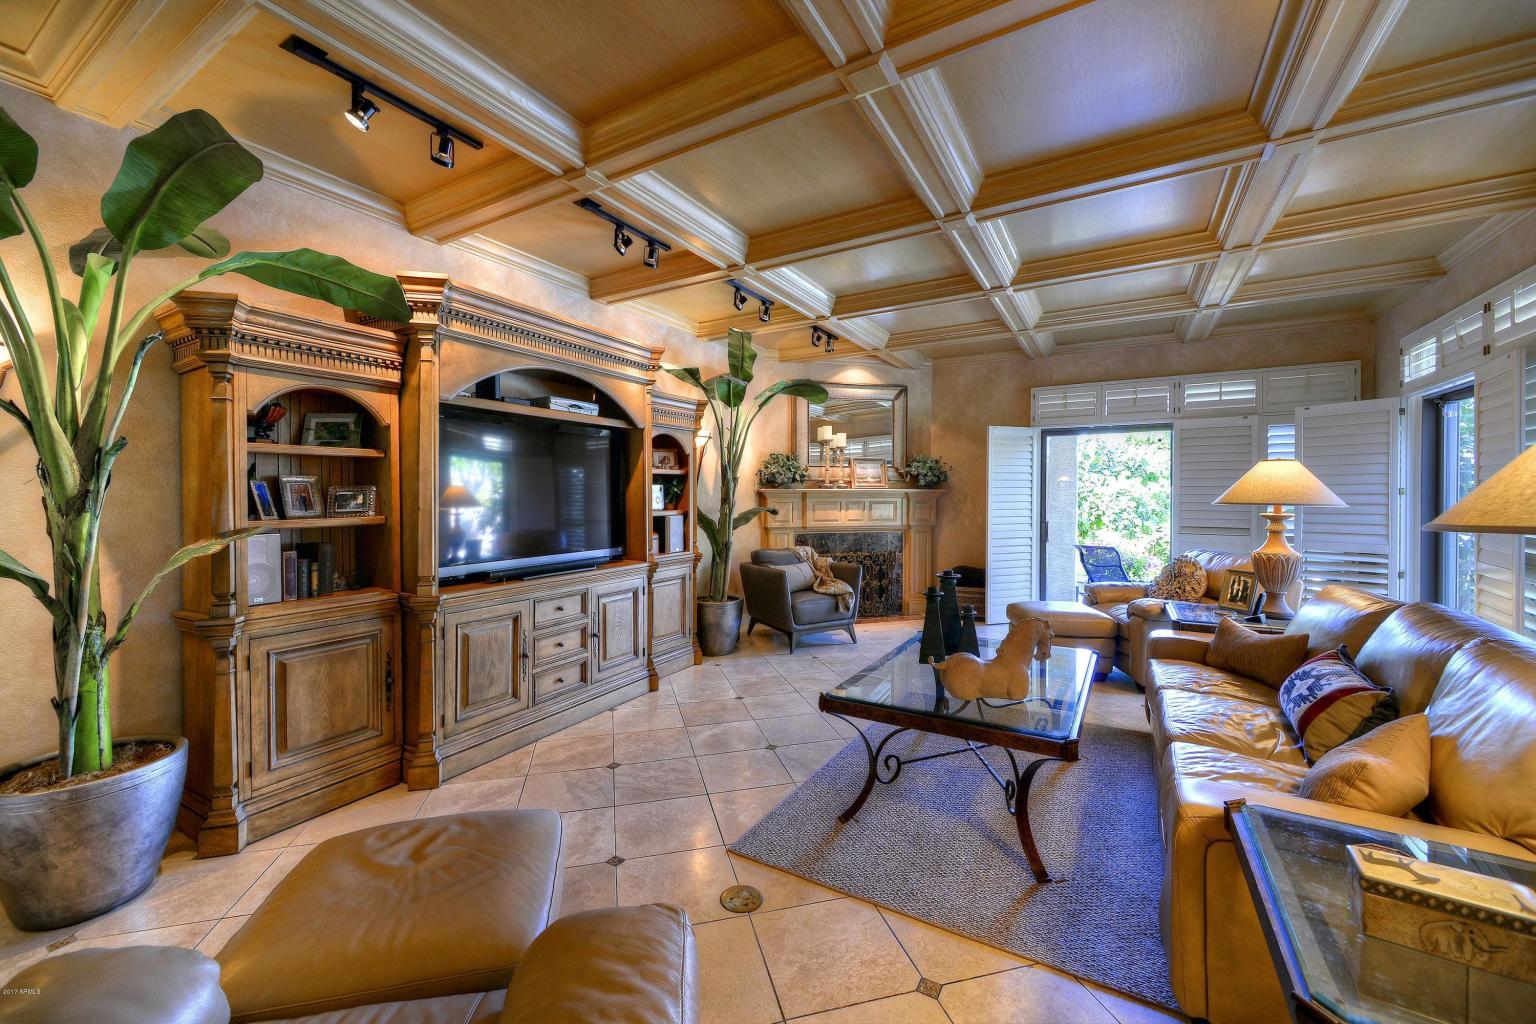 3105 E San Juan Ave, Phoenix | $800,000